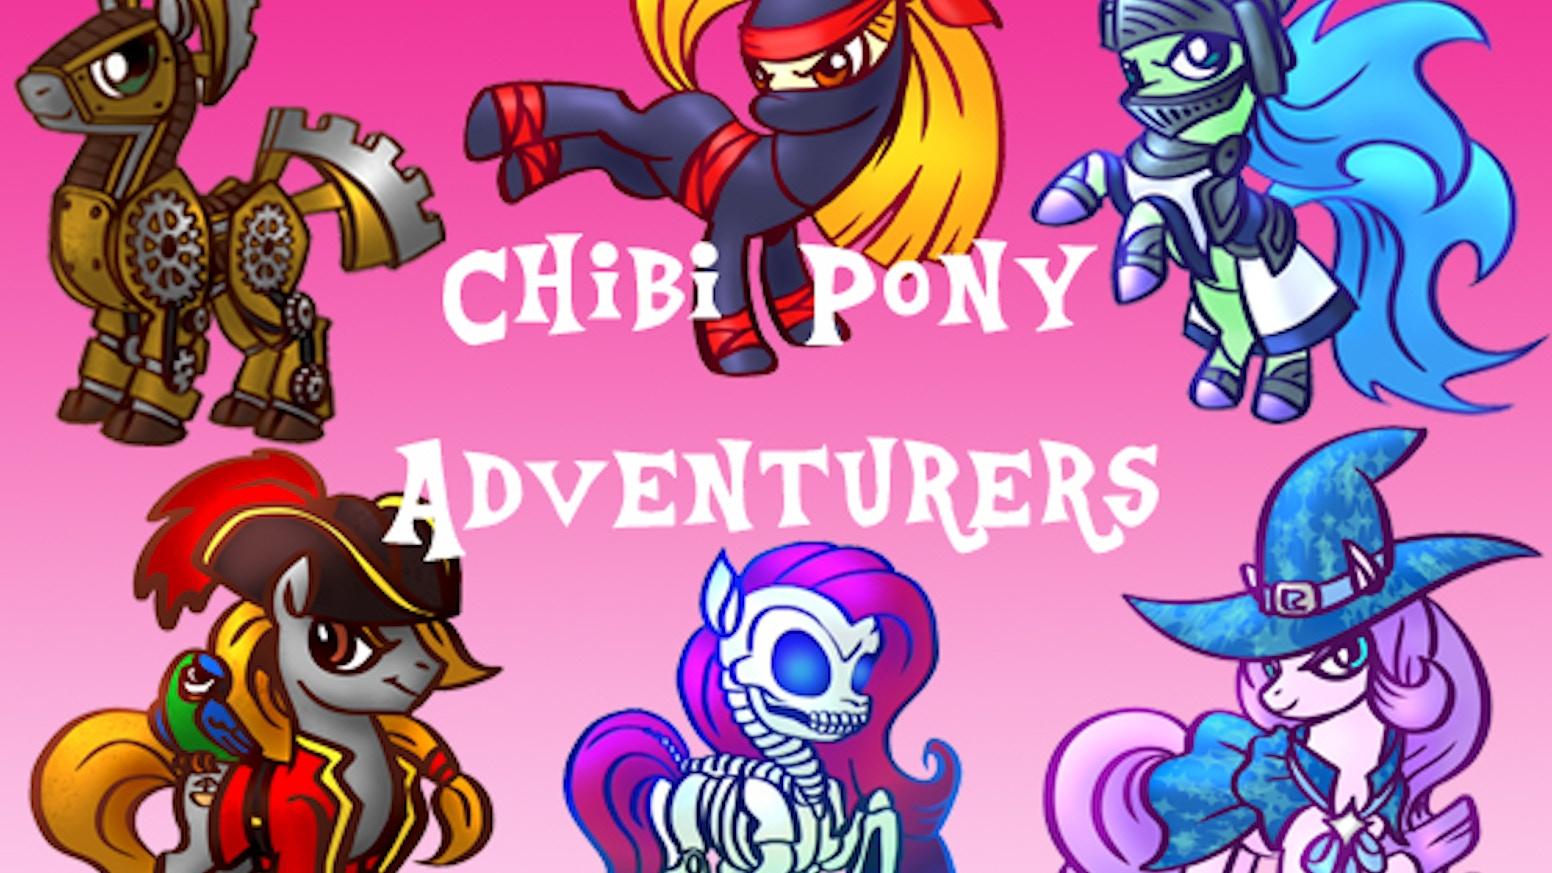 Chibi Pony Adventurers Miniatures by Impact! Miniatures » Updates ...